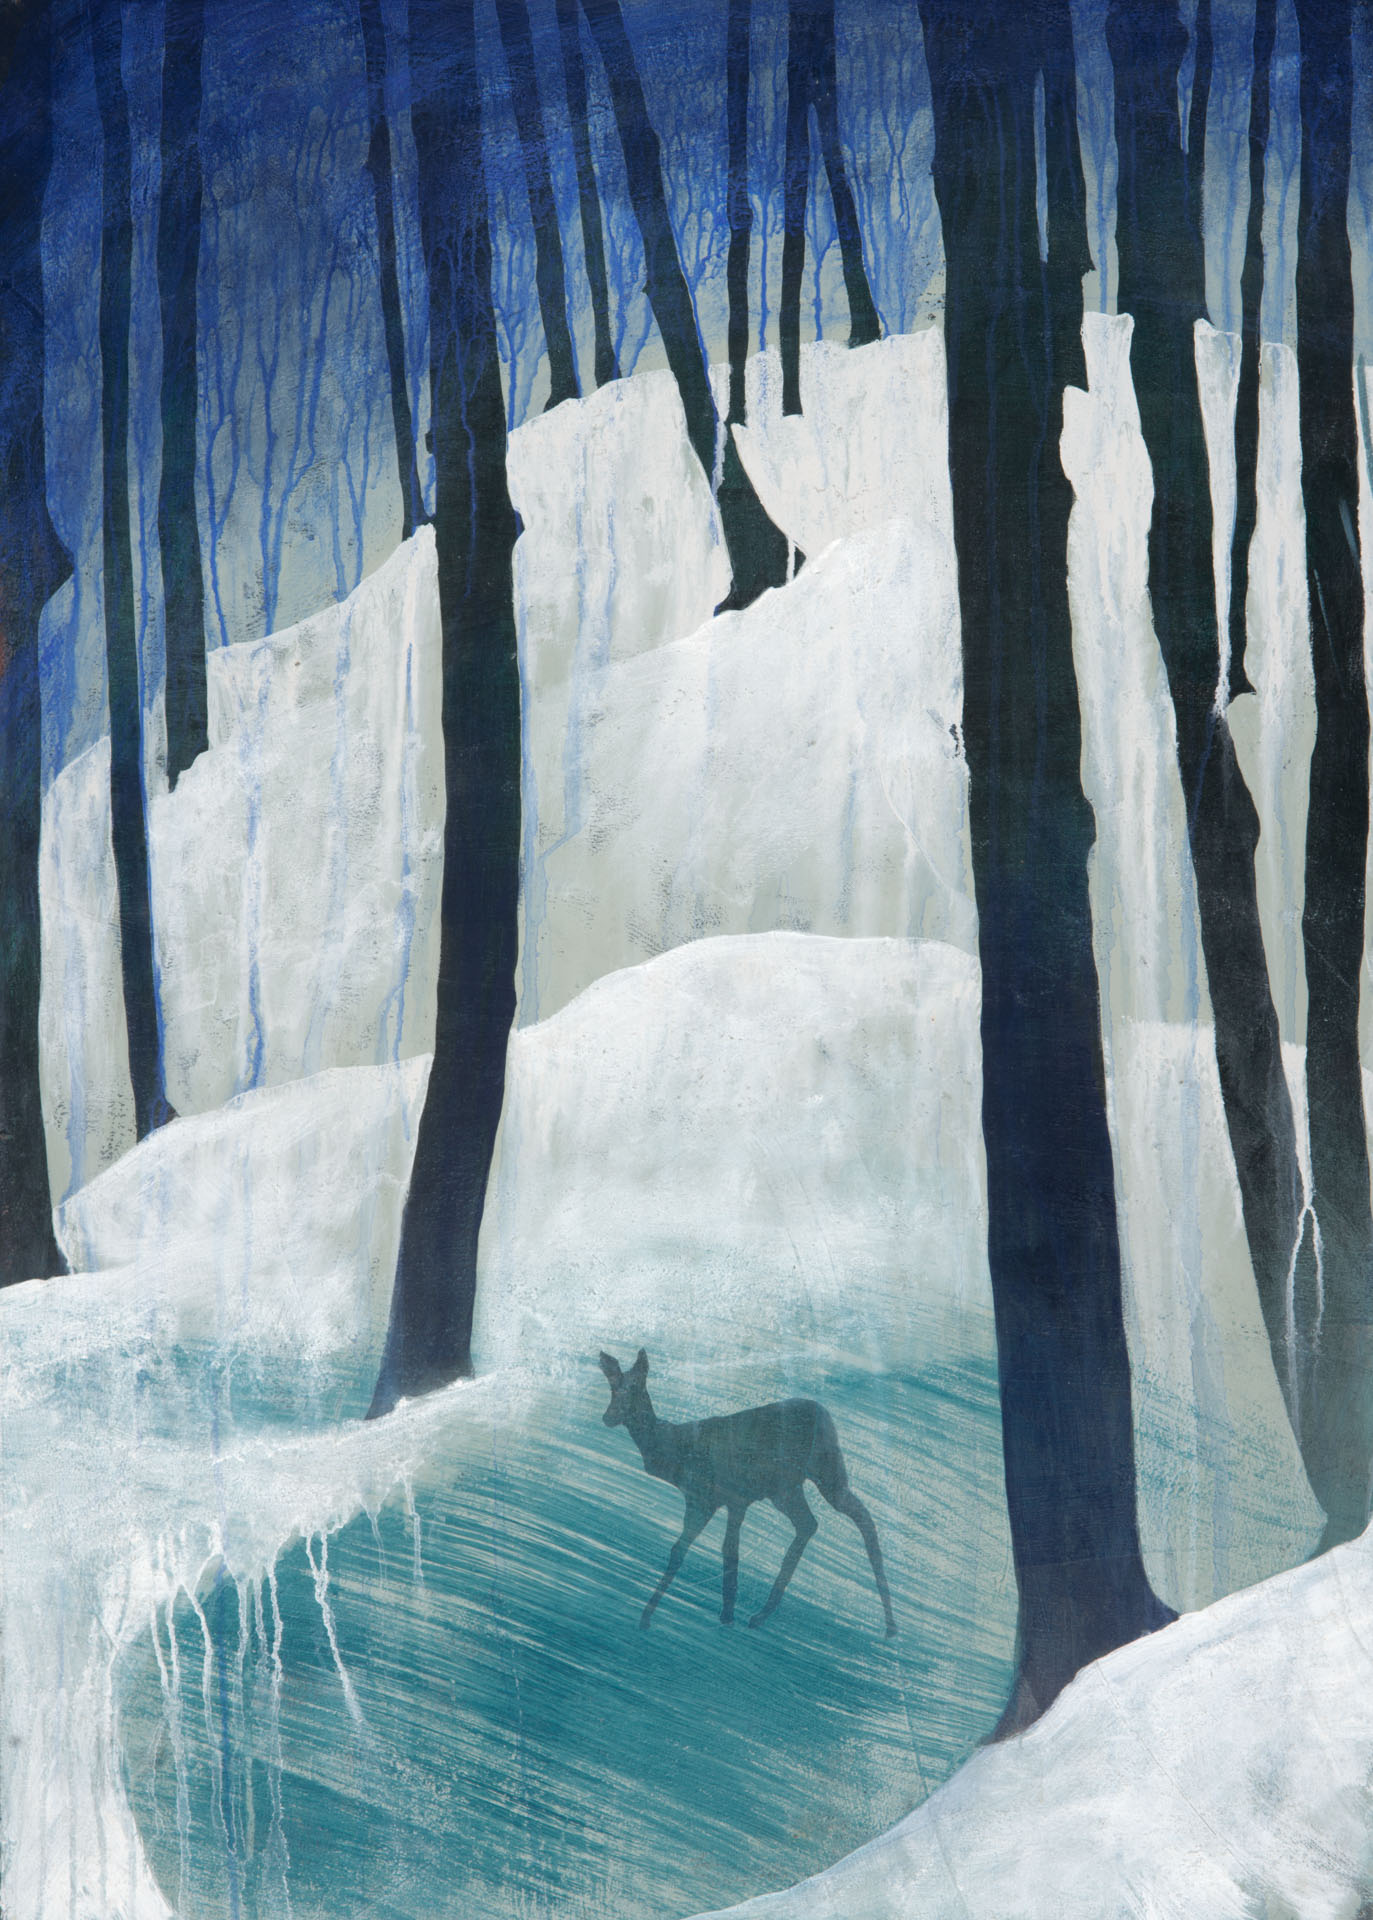 Winter Doe I - Woodstock, Vermont